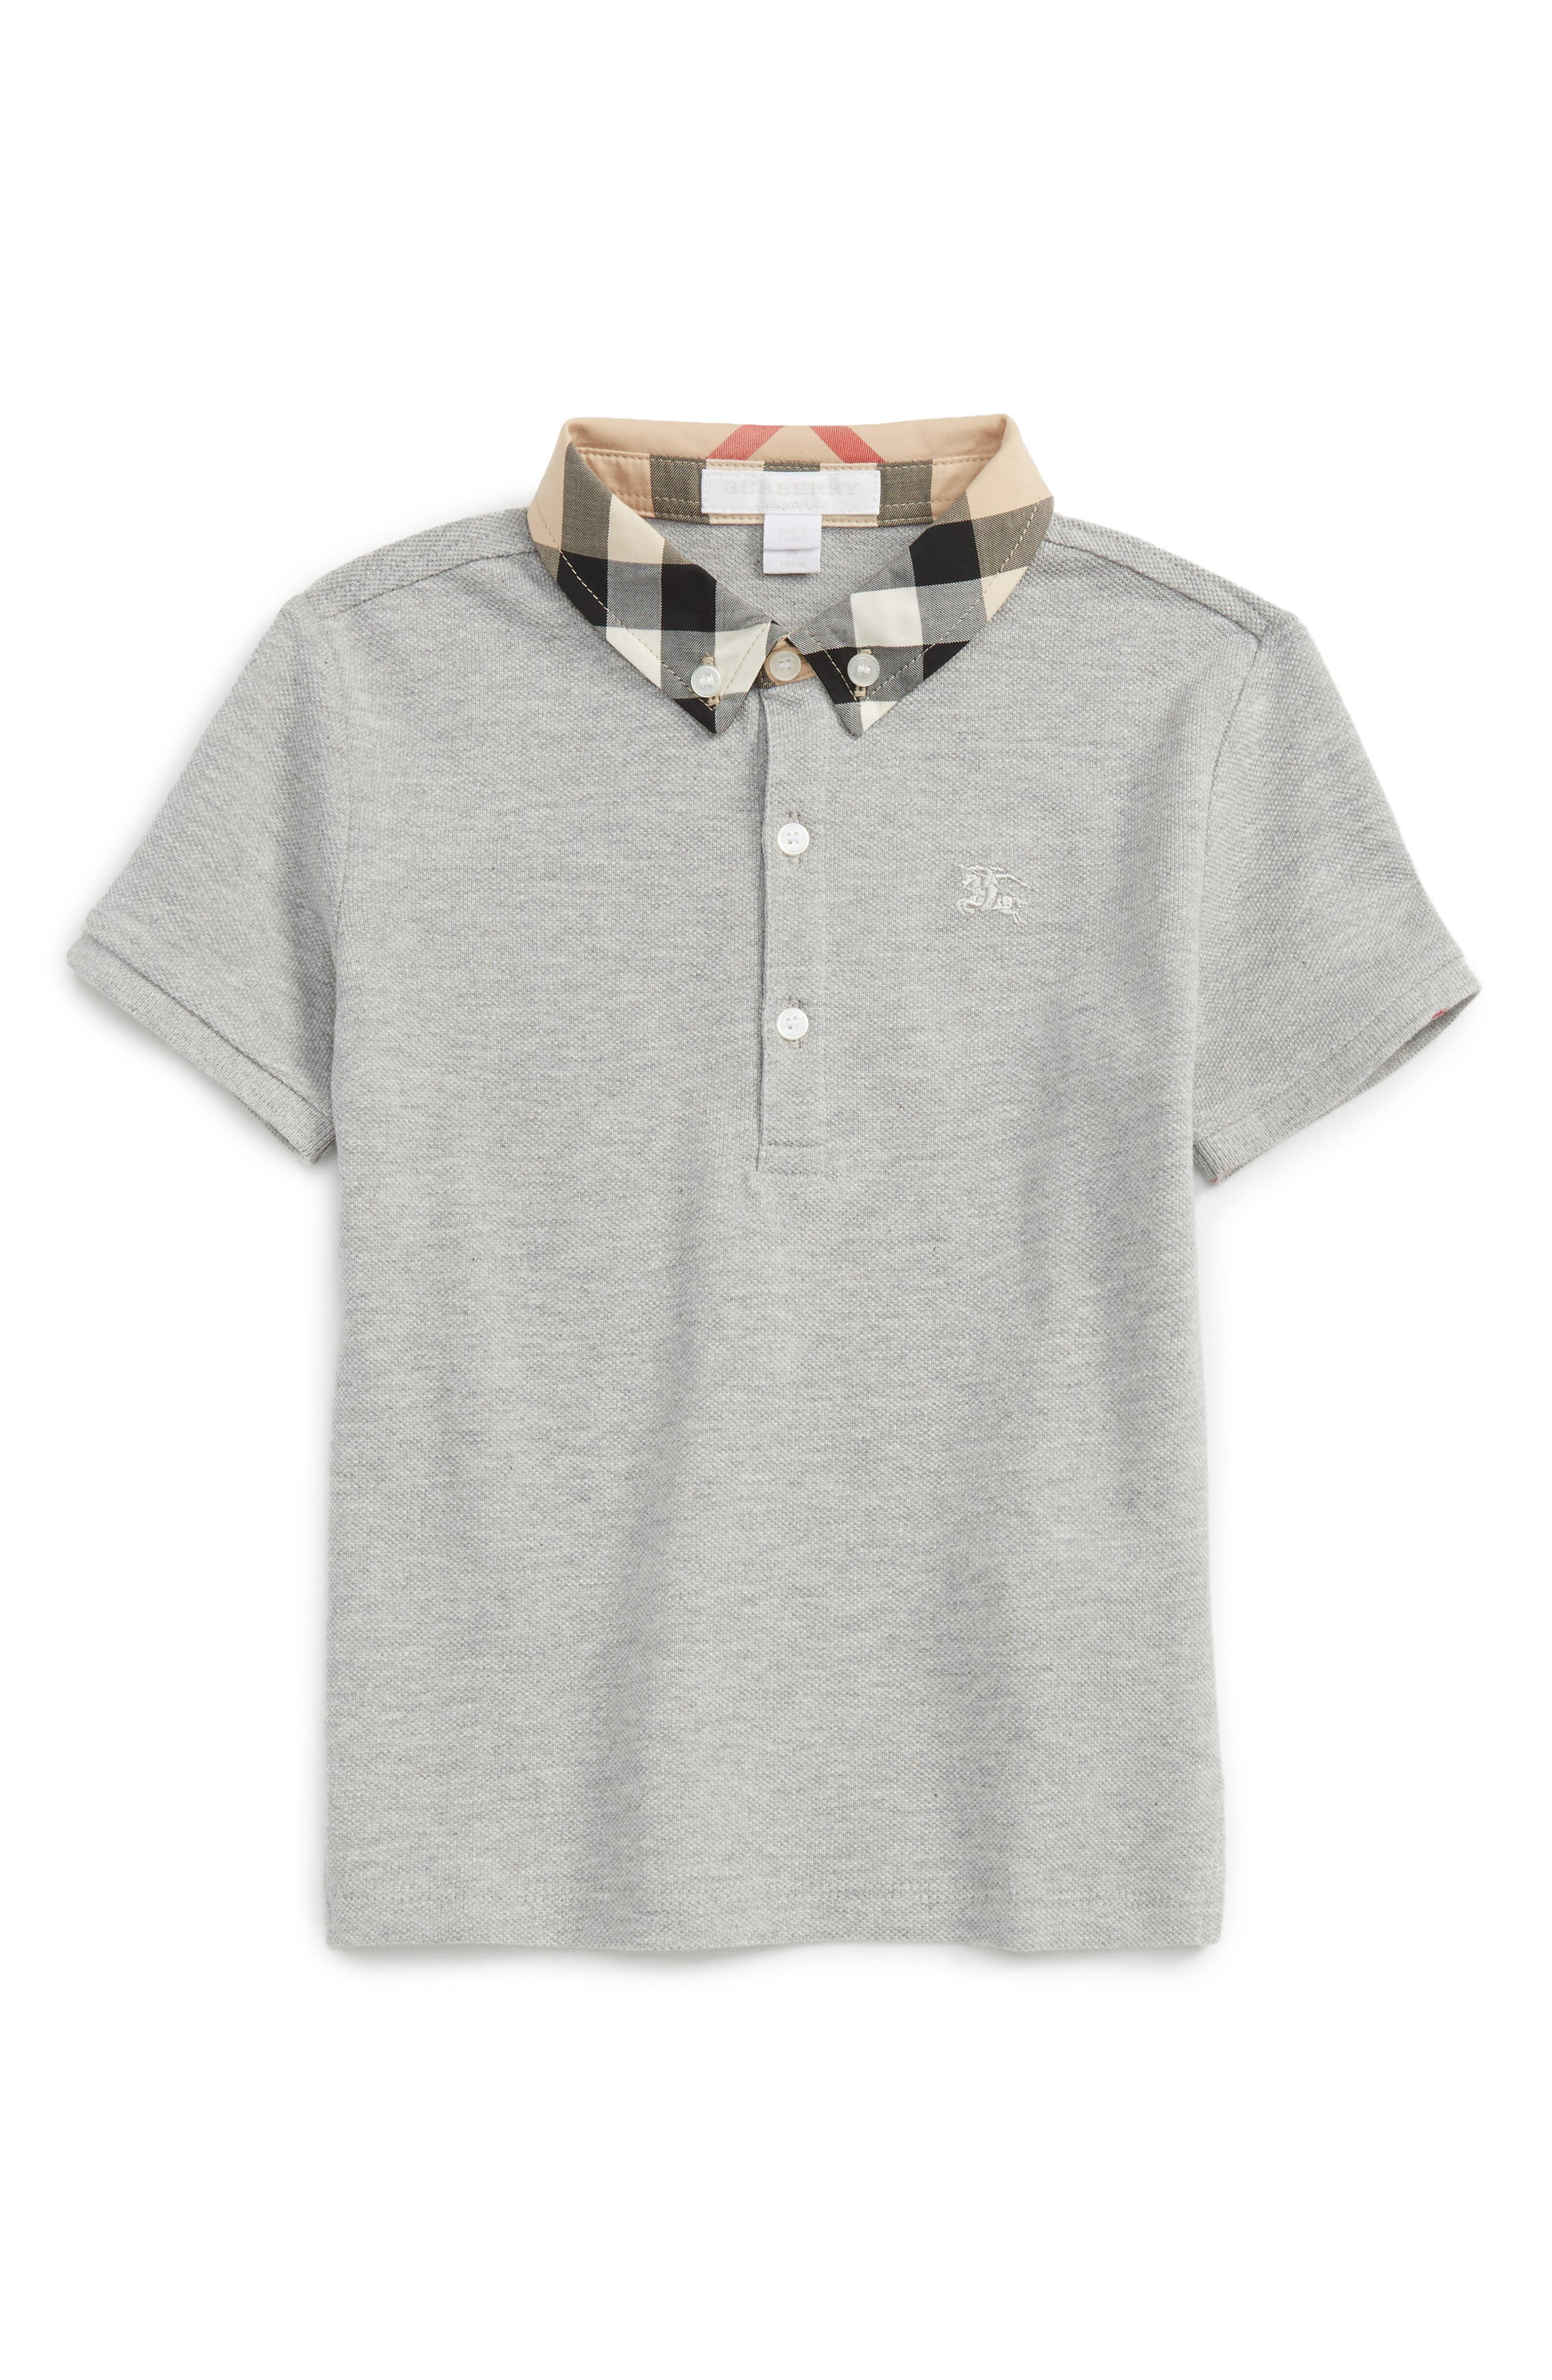 Check Collar Polo,                         Main,                         color, Pale Grey Melange